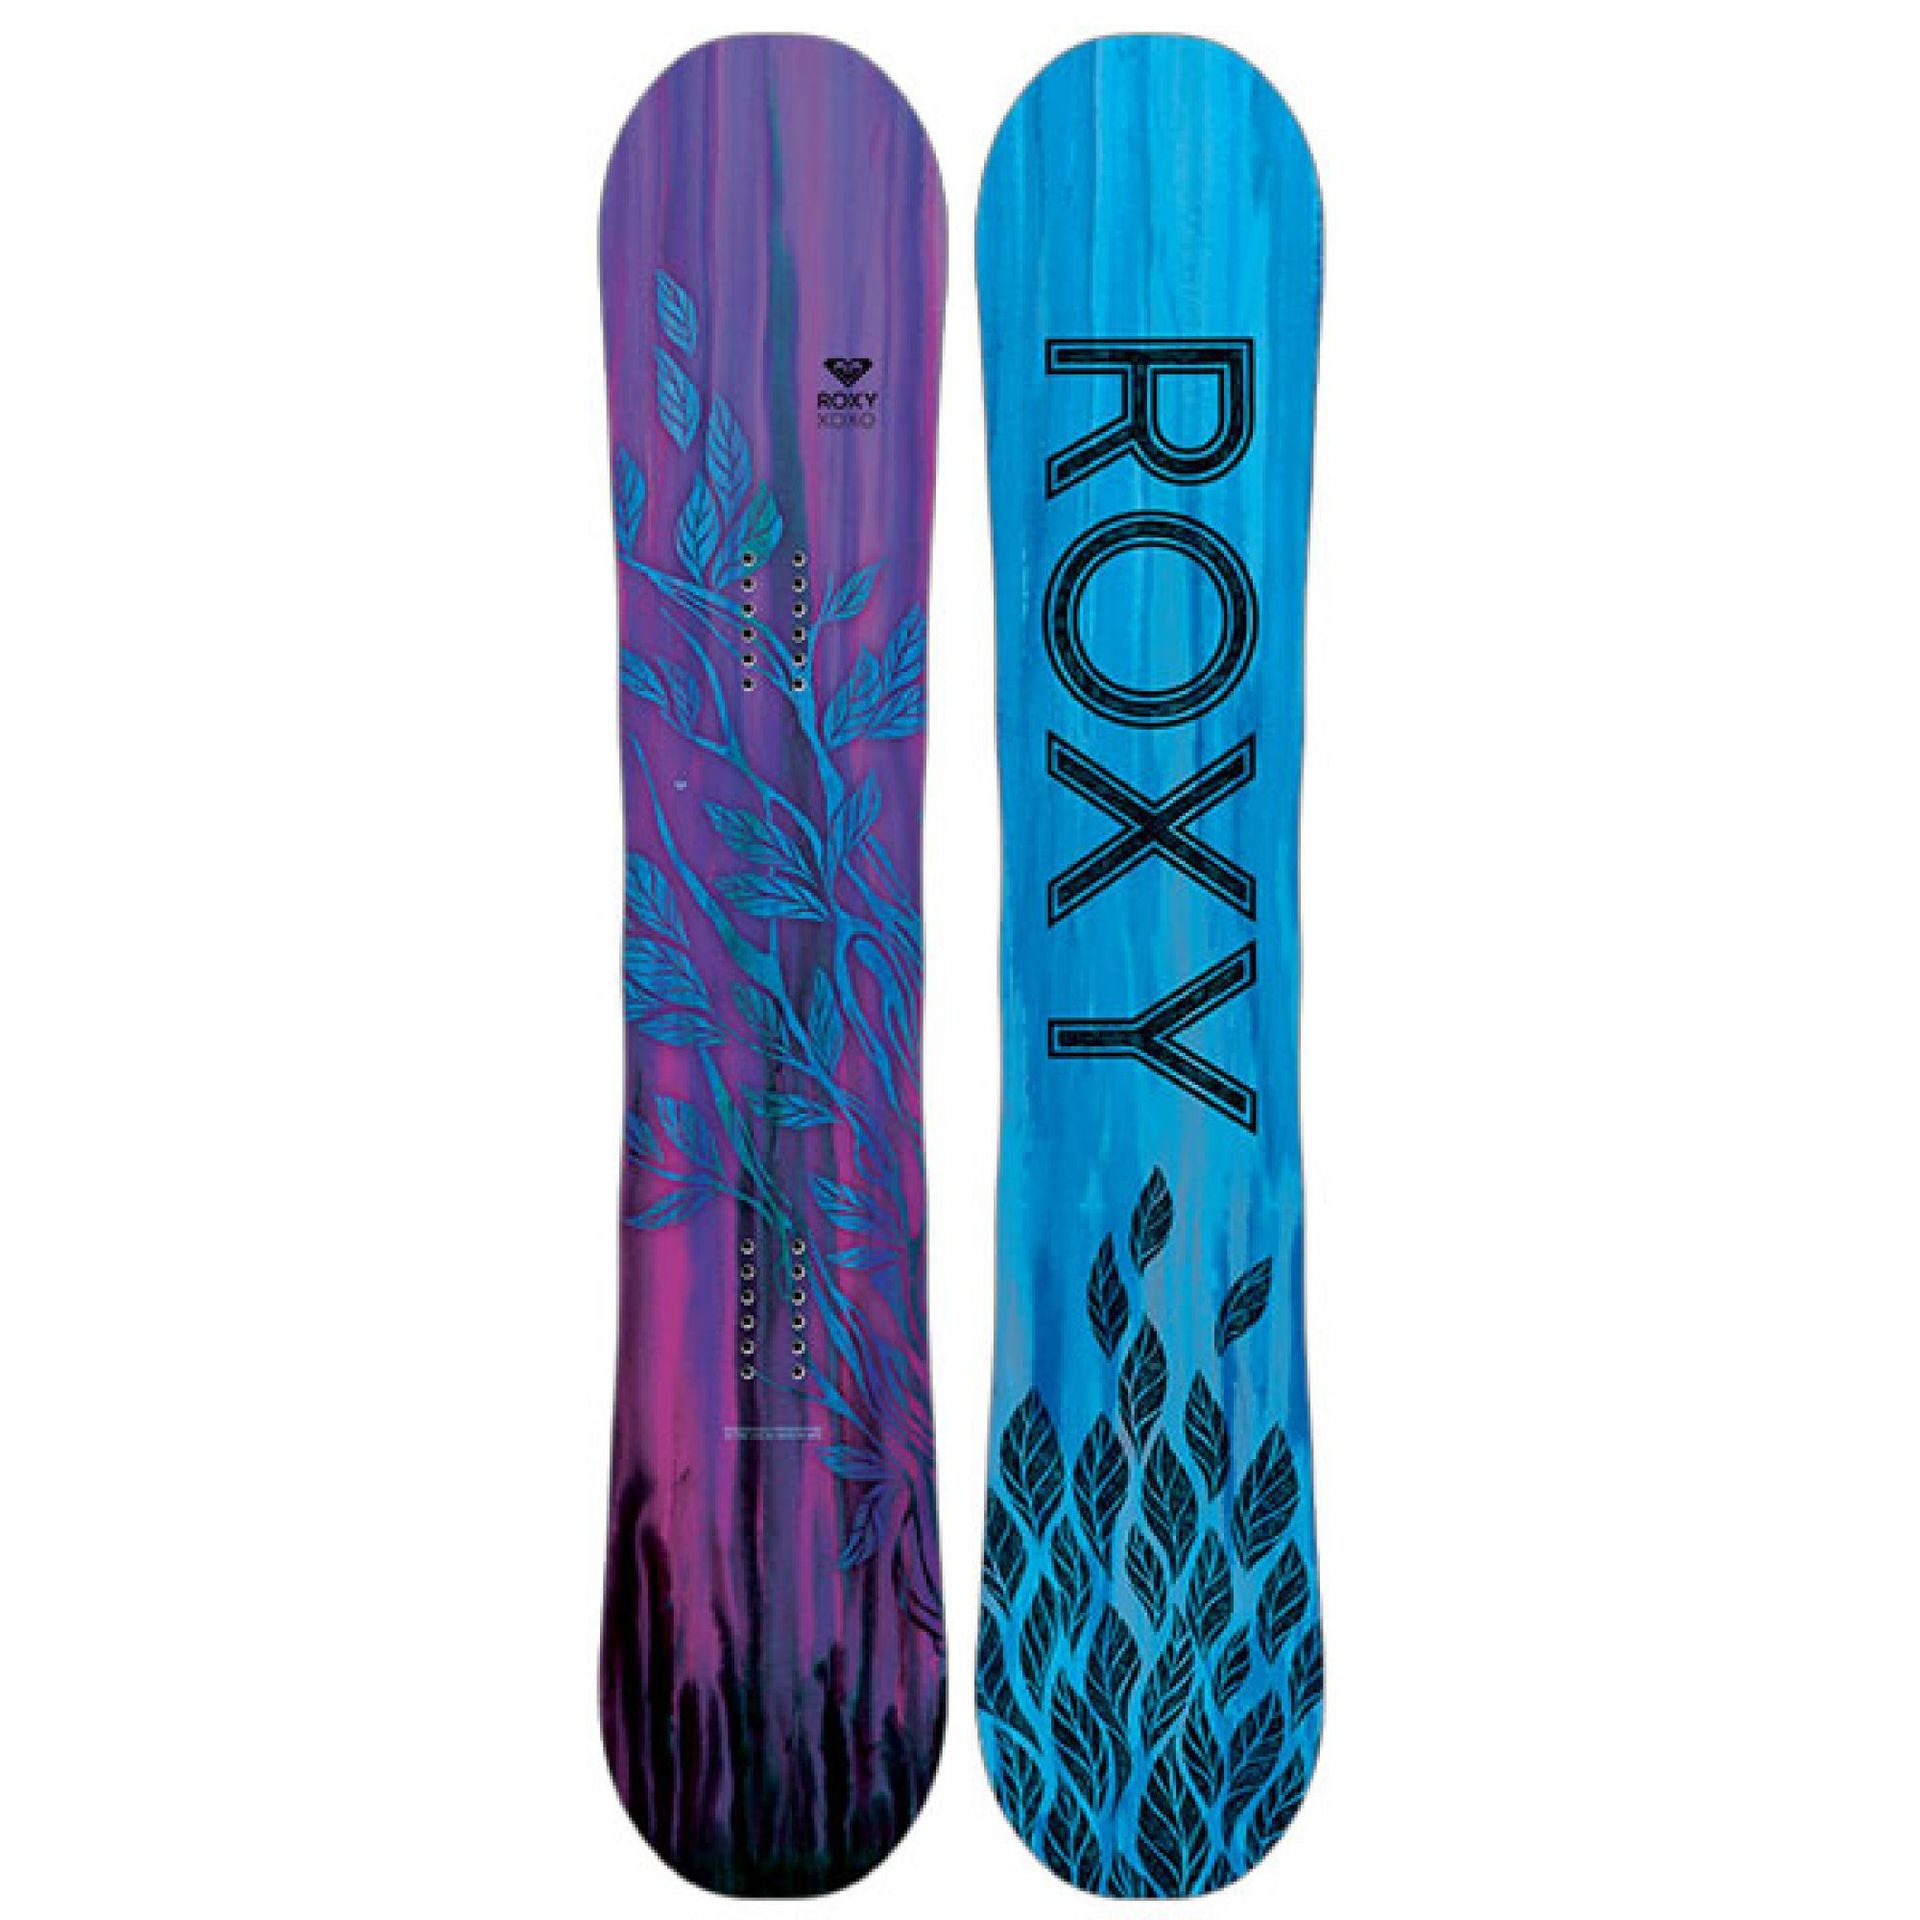 DESKA SNOWBOARDOWA ROXY XOXO LEAVES